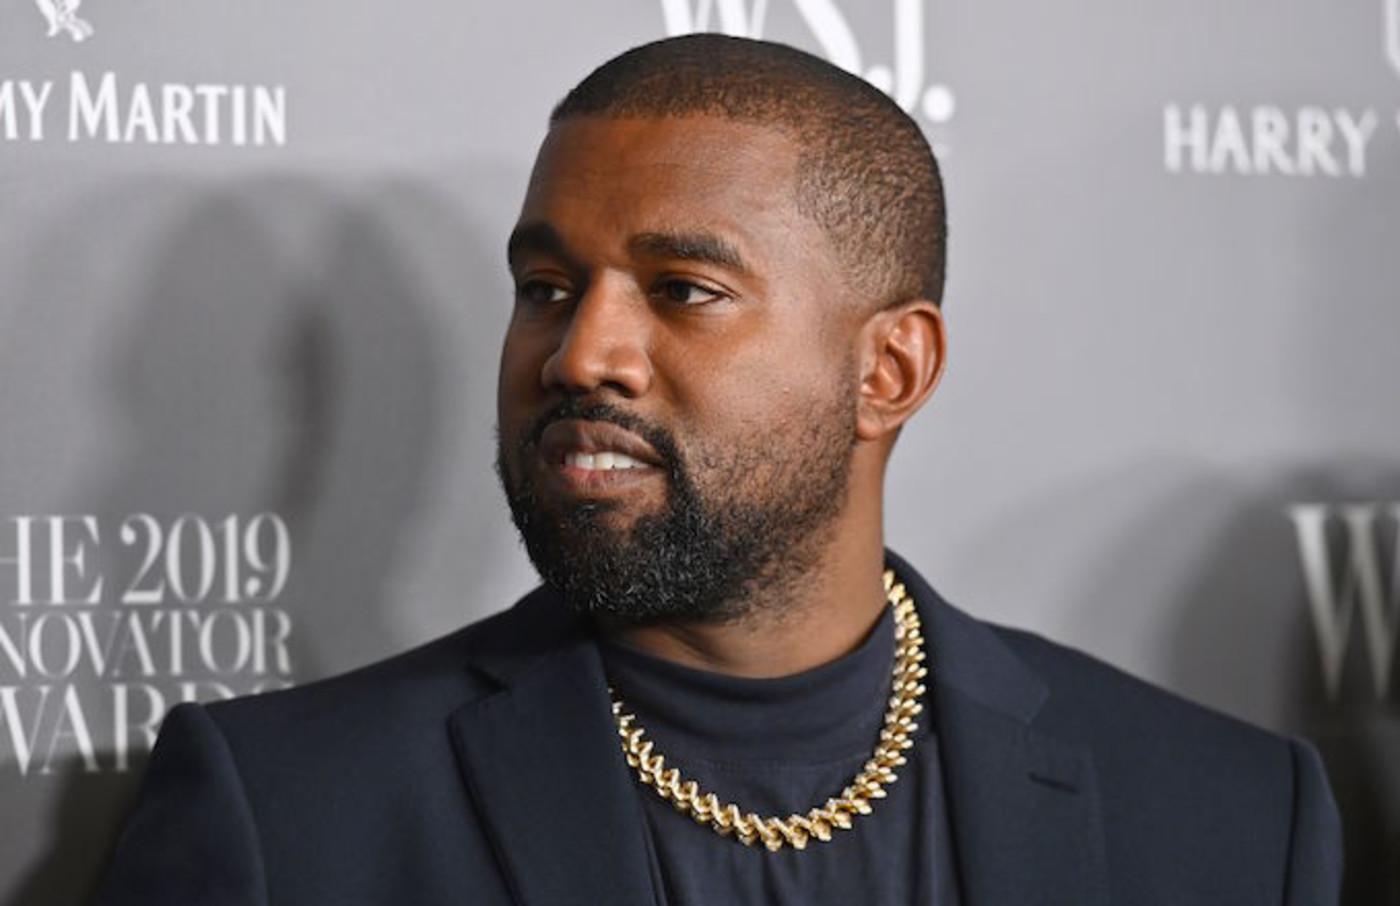 Kanye West attends the WSJ Magazine 2019 Innovator Awards.